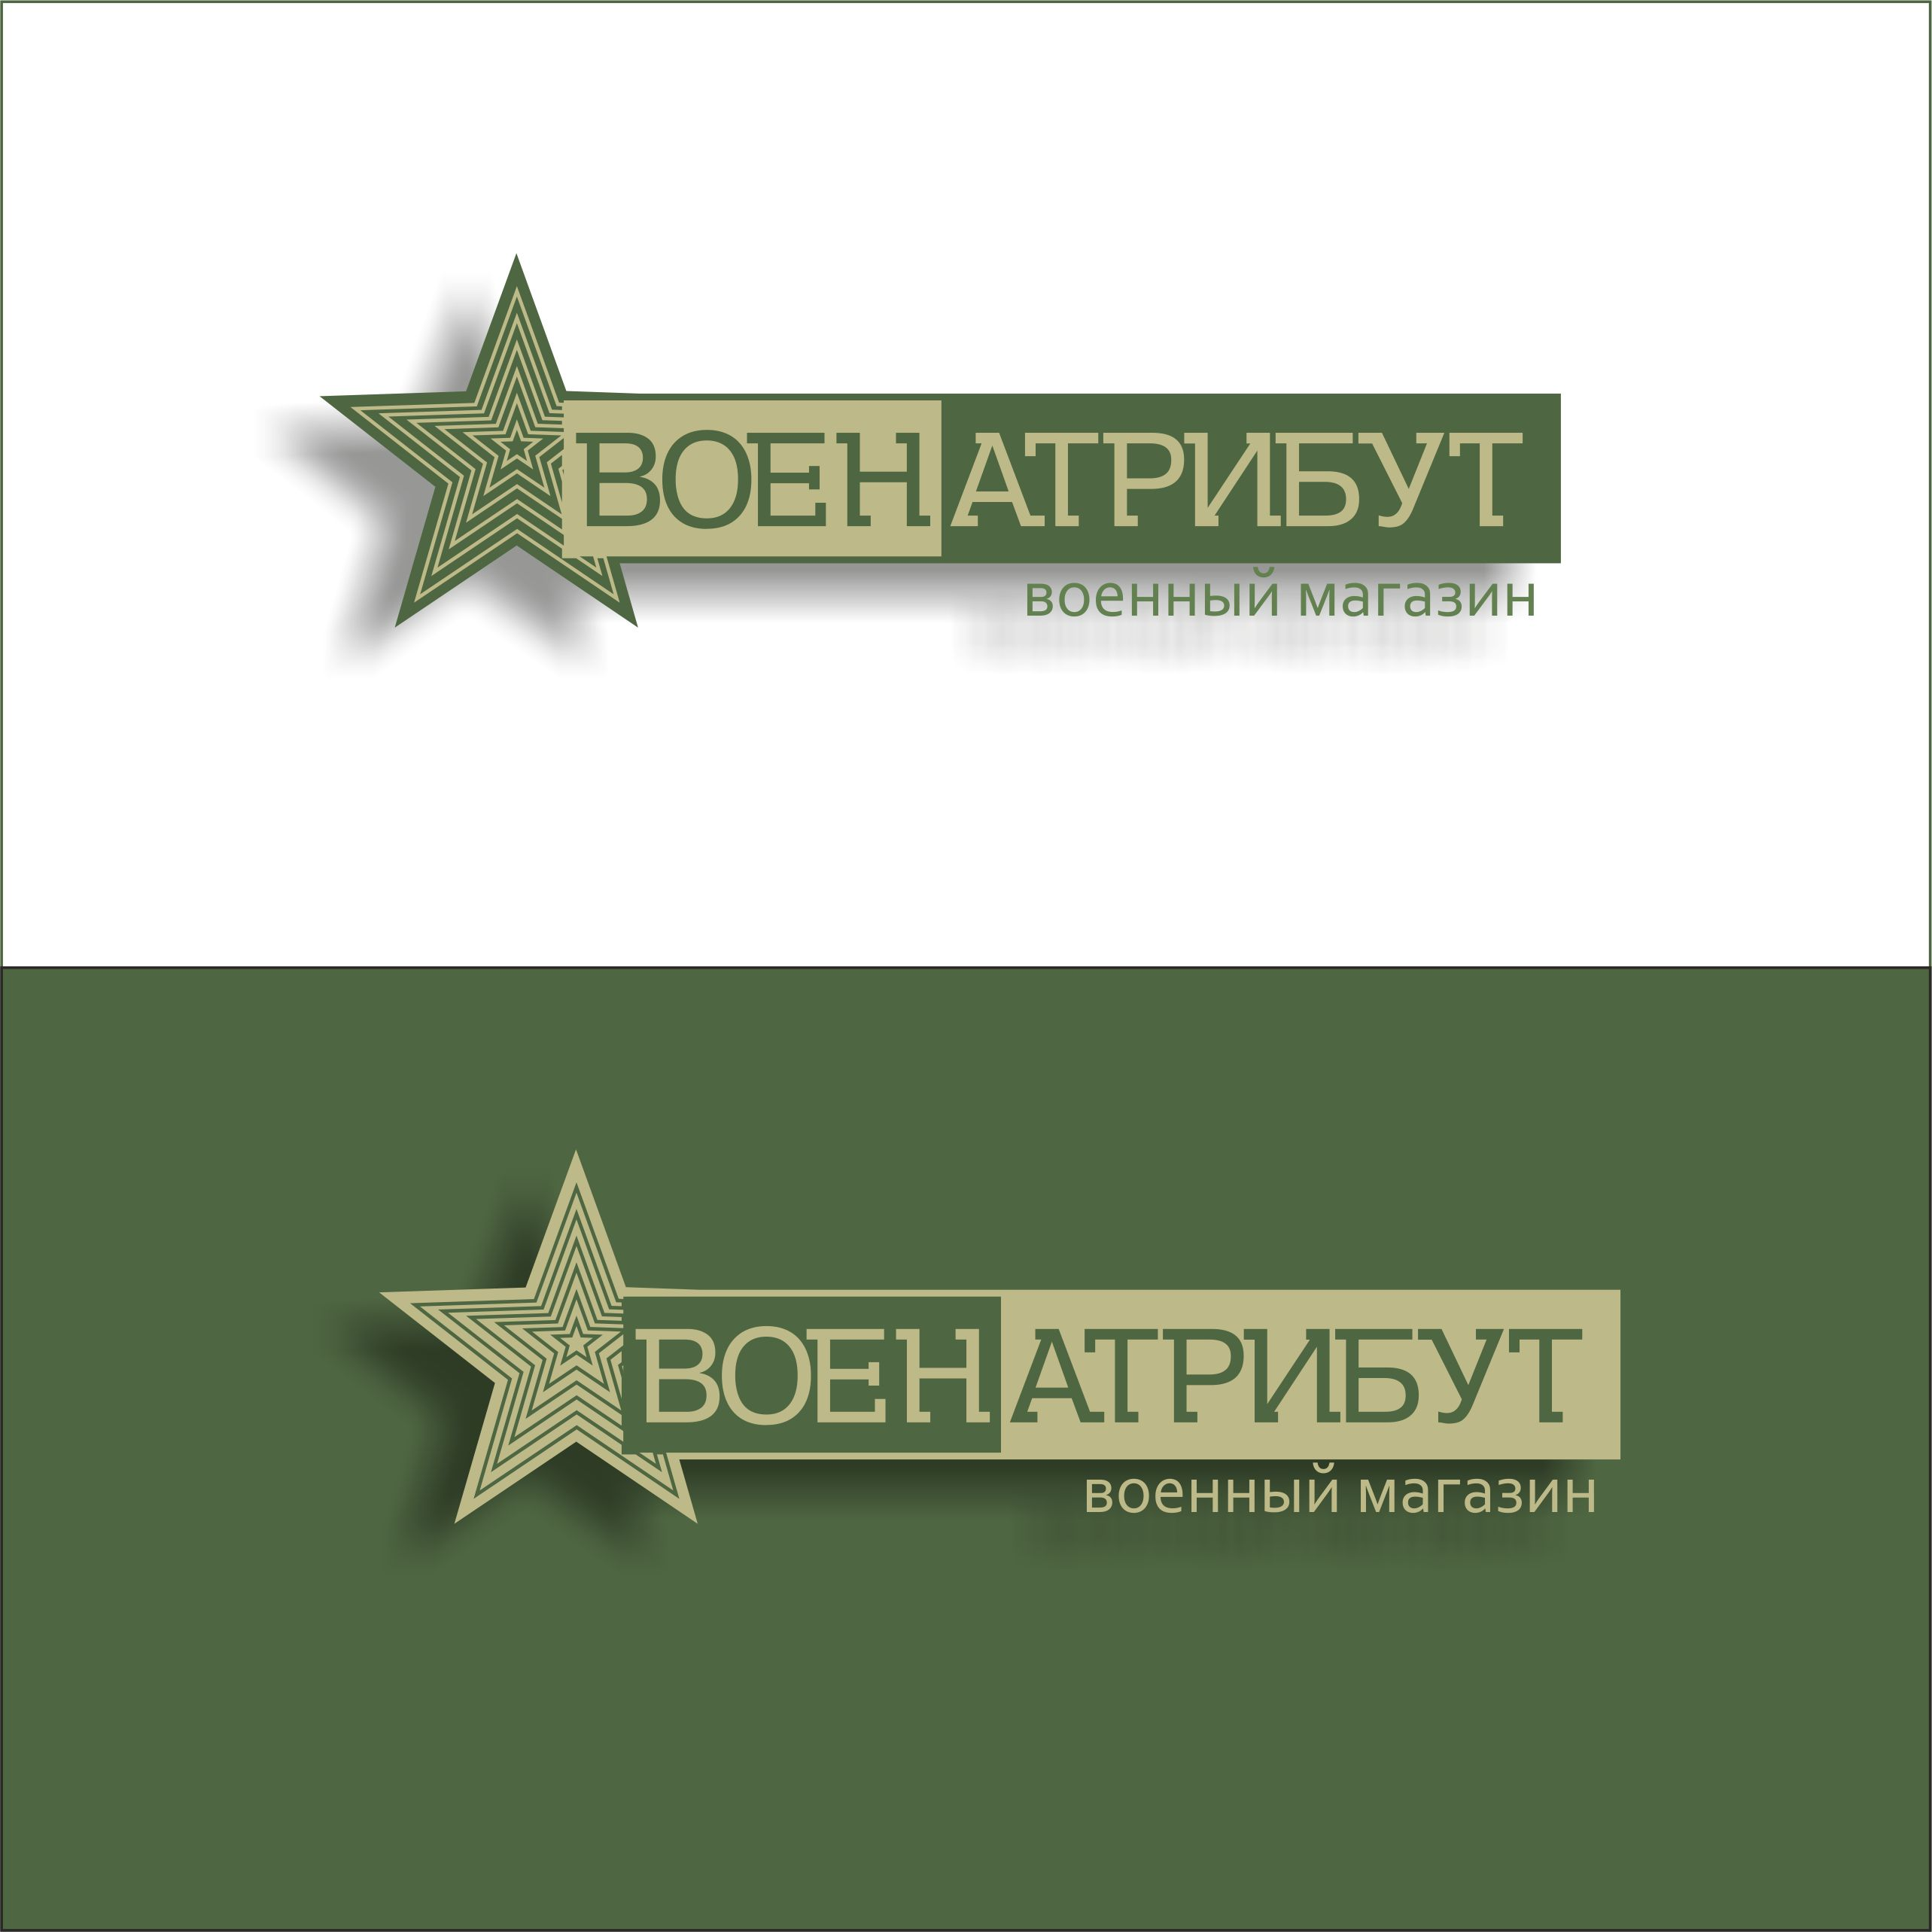 Разработка логотипа для компании военной тематики фото f_9776026589280cb7.jpg